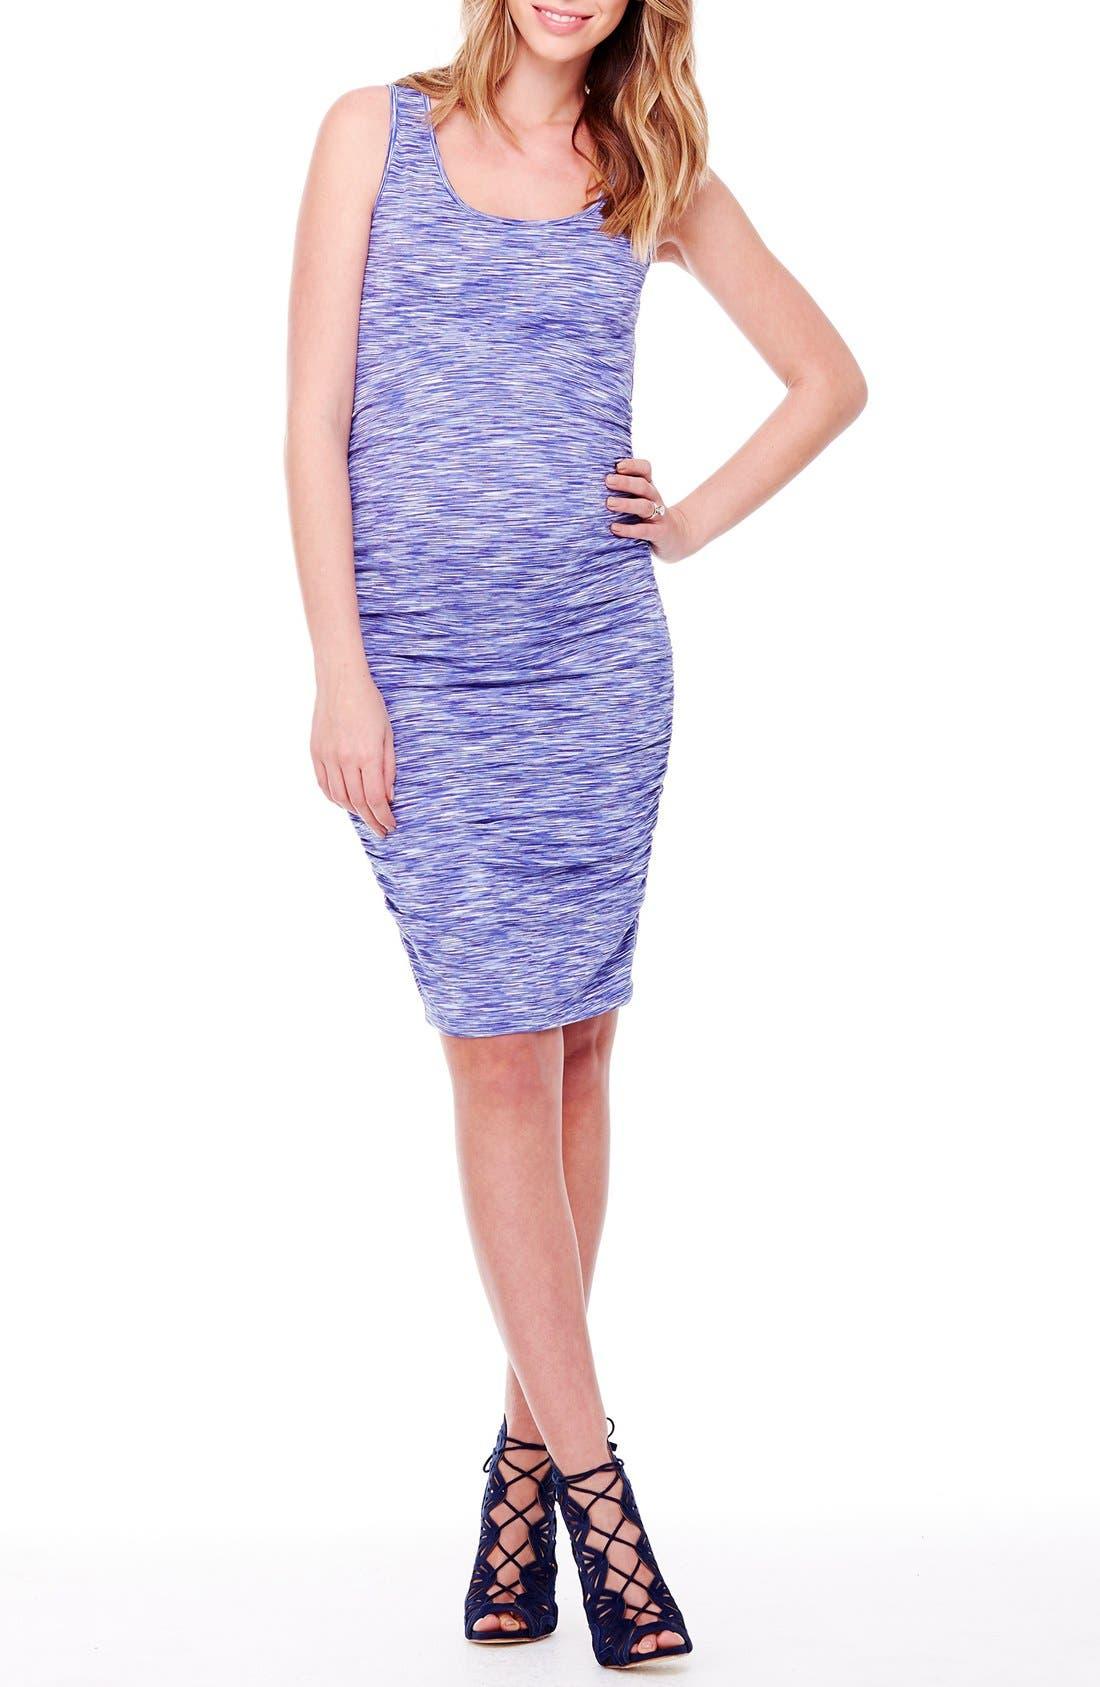 Main Image - Ingrid & Isabel® Space Dye Ruched Maternity Tank Dress